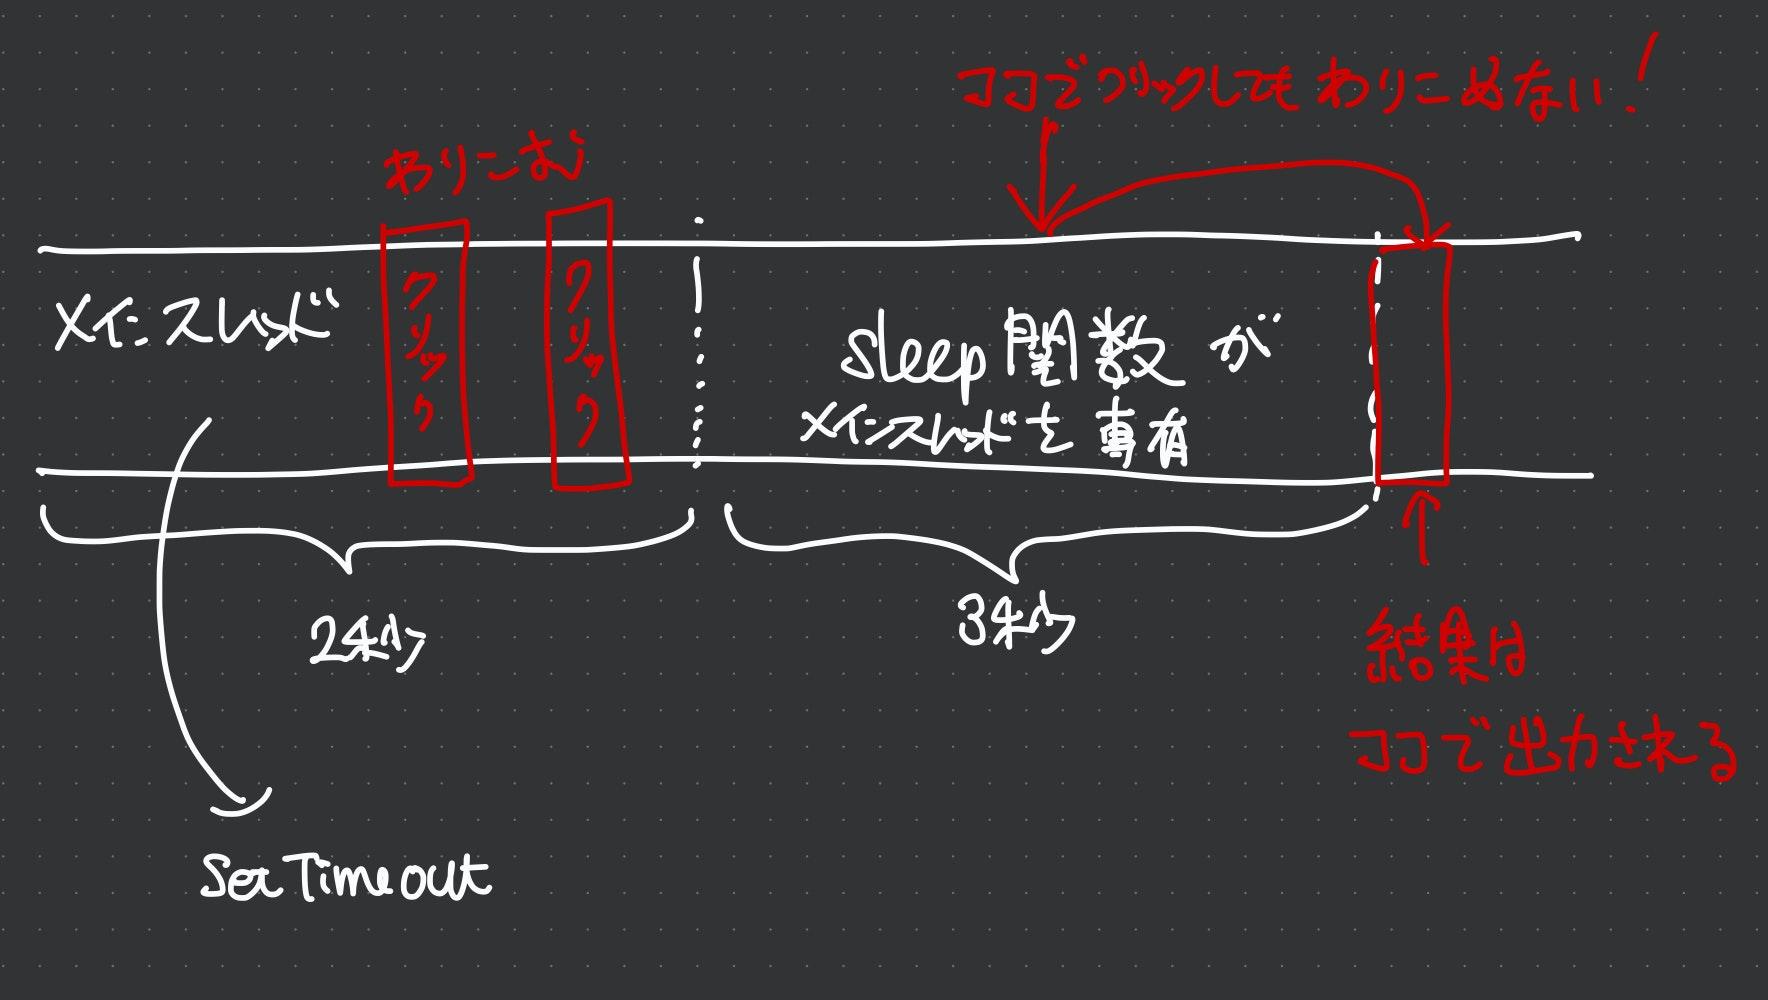 IMG_0BB0184B4DC2-1.jpeg